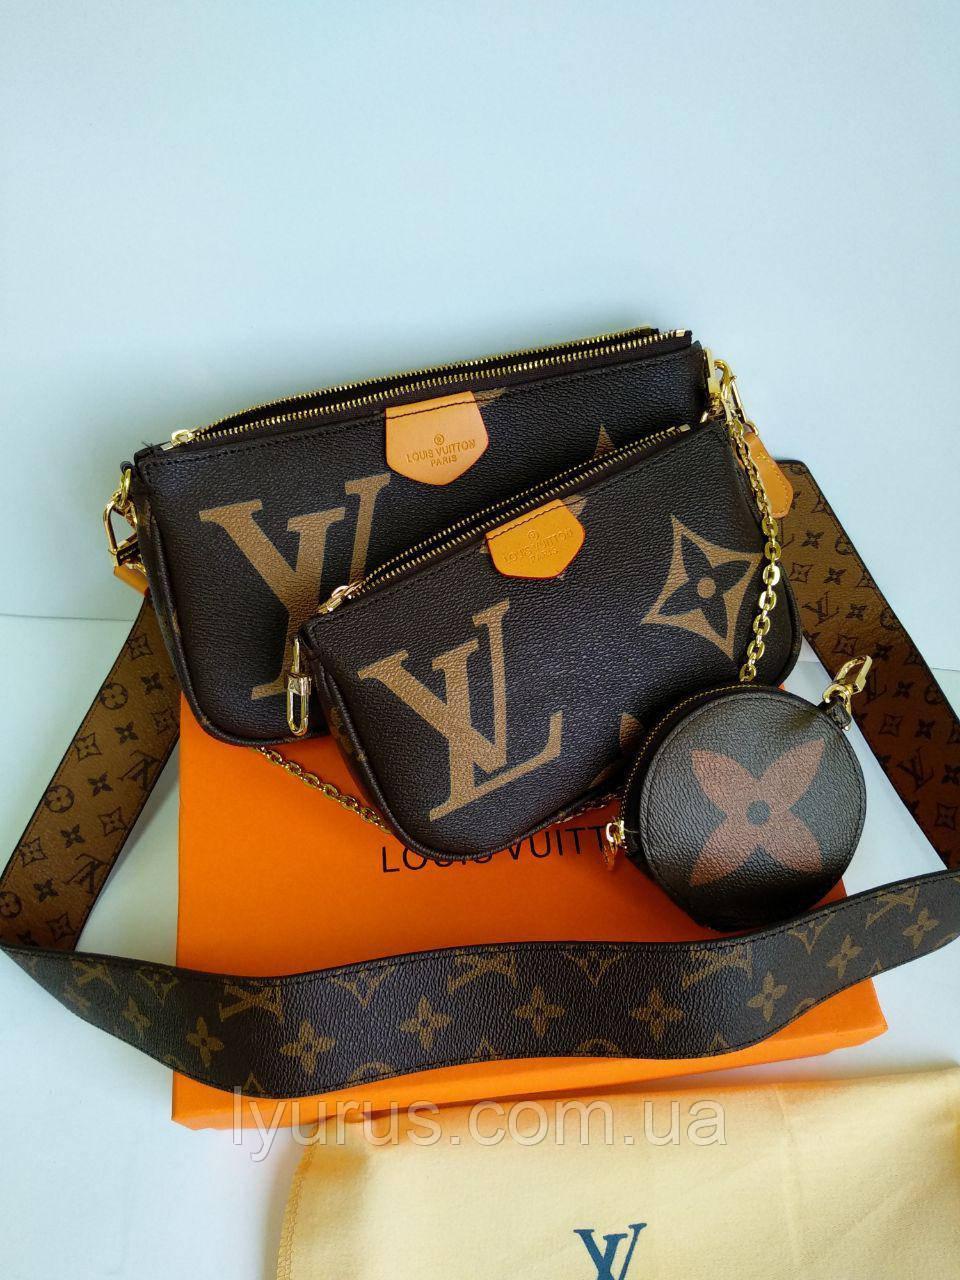 Женская сумка клатч Louis Vuitton Multi Pochette принт LV (Луи Витон)